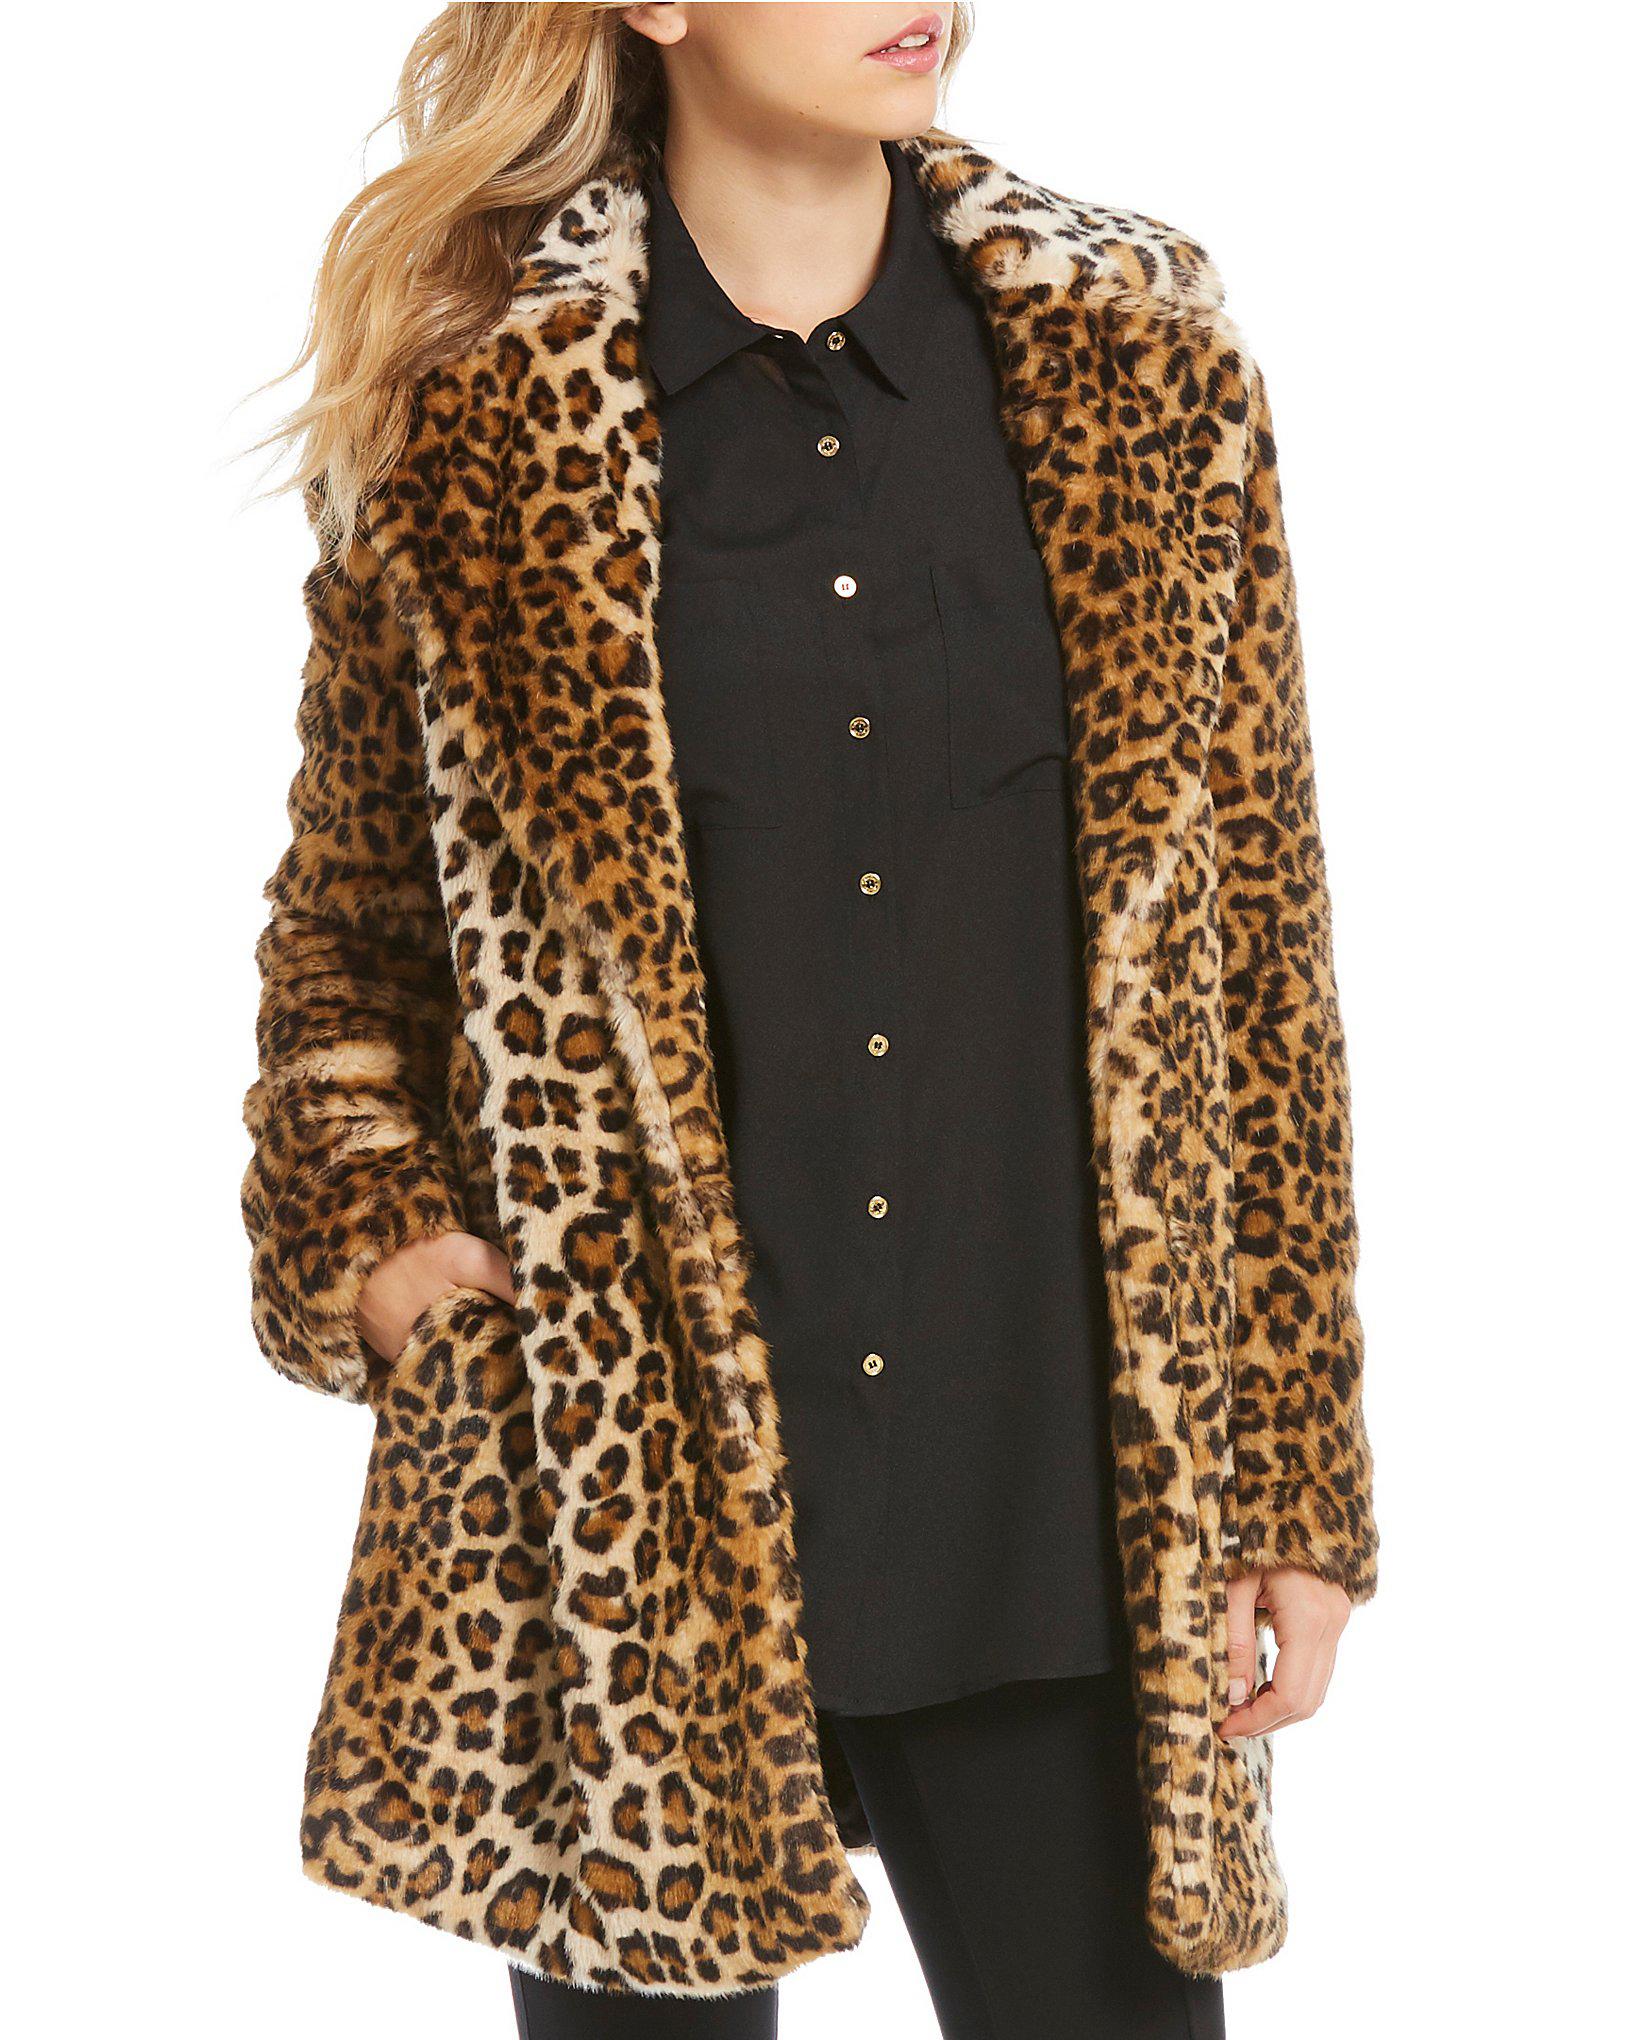 Find great deals on eBay for leopard fur jacket coat. Shop with confidence.